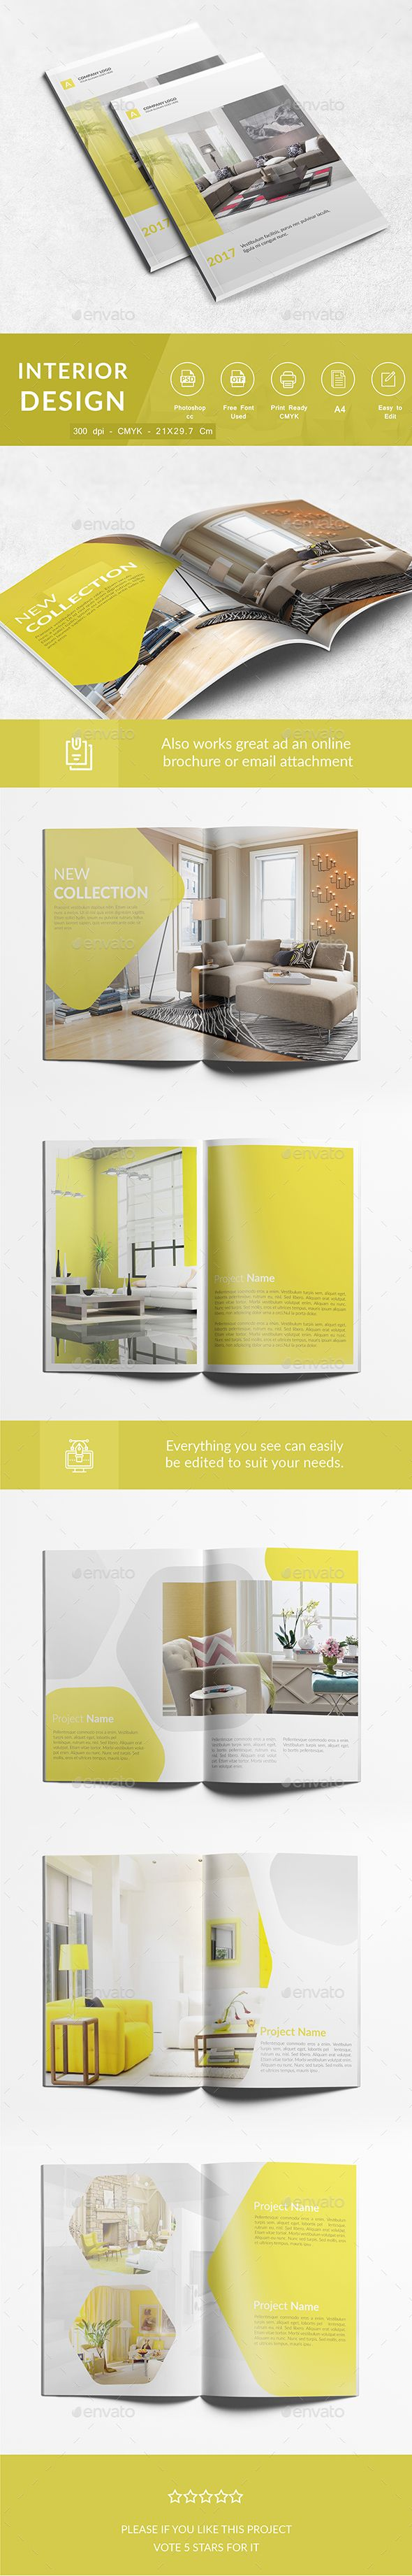 Interior Design A4